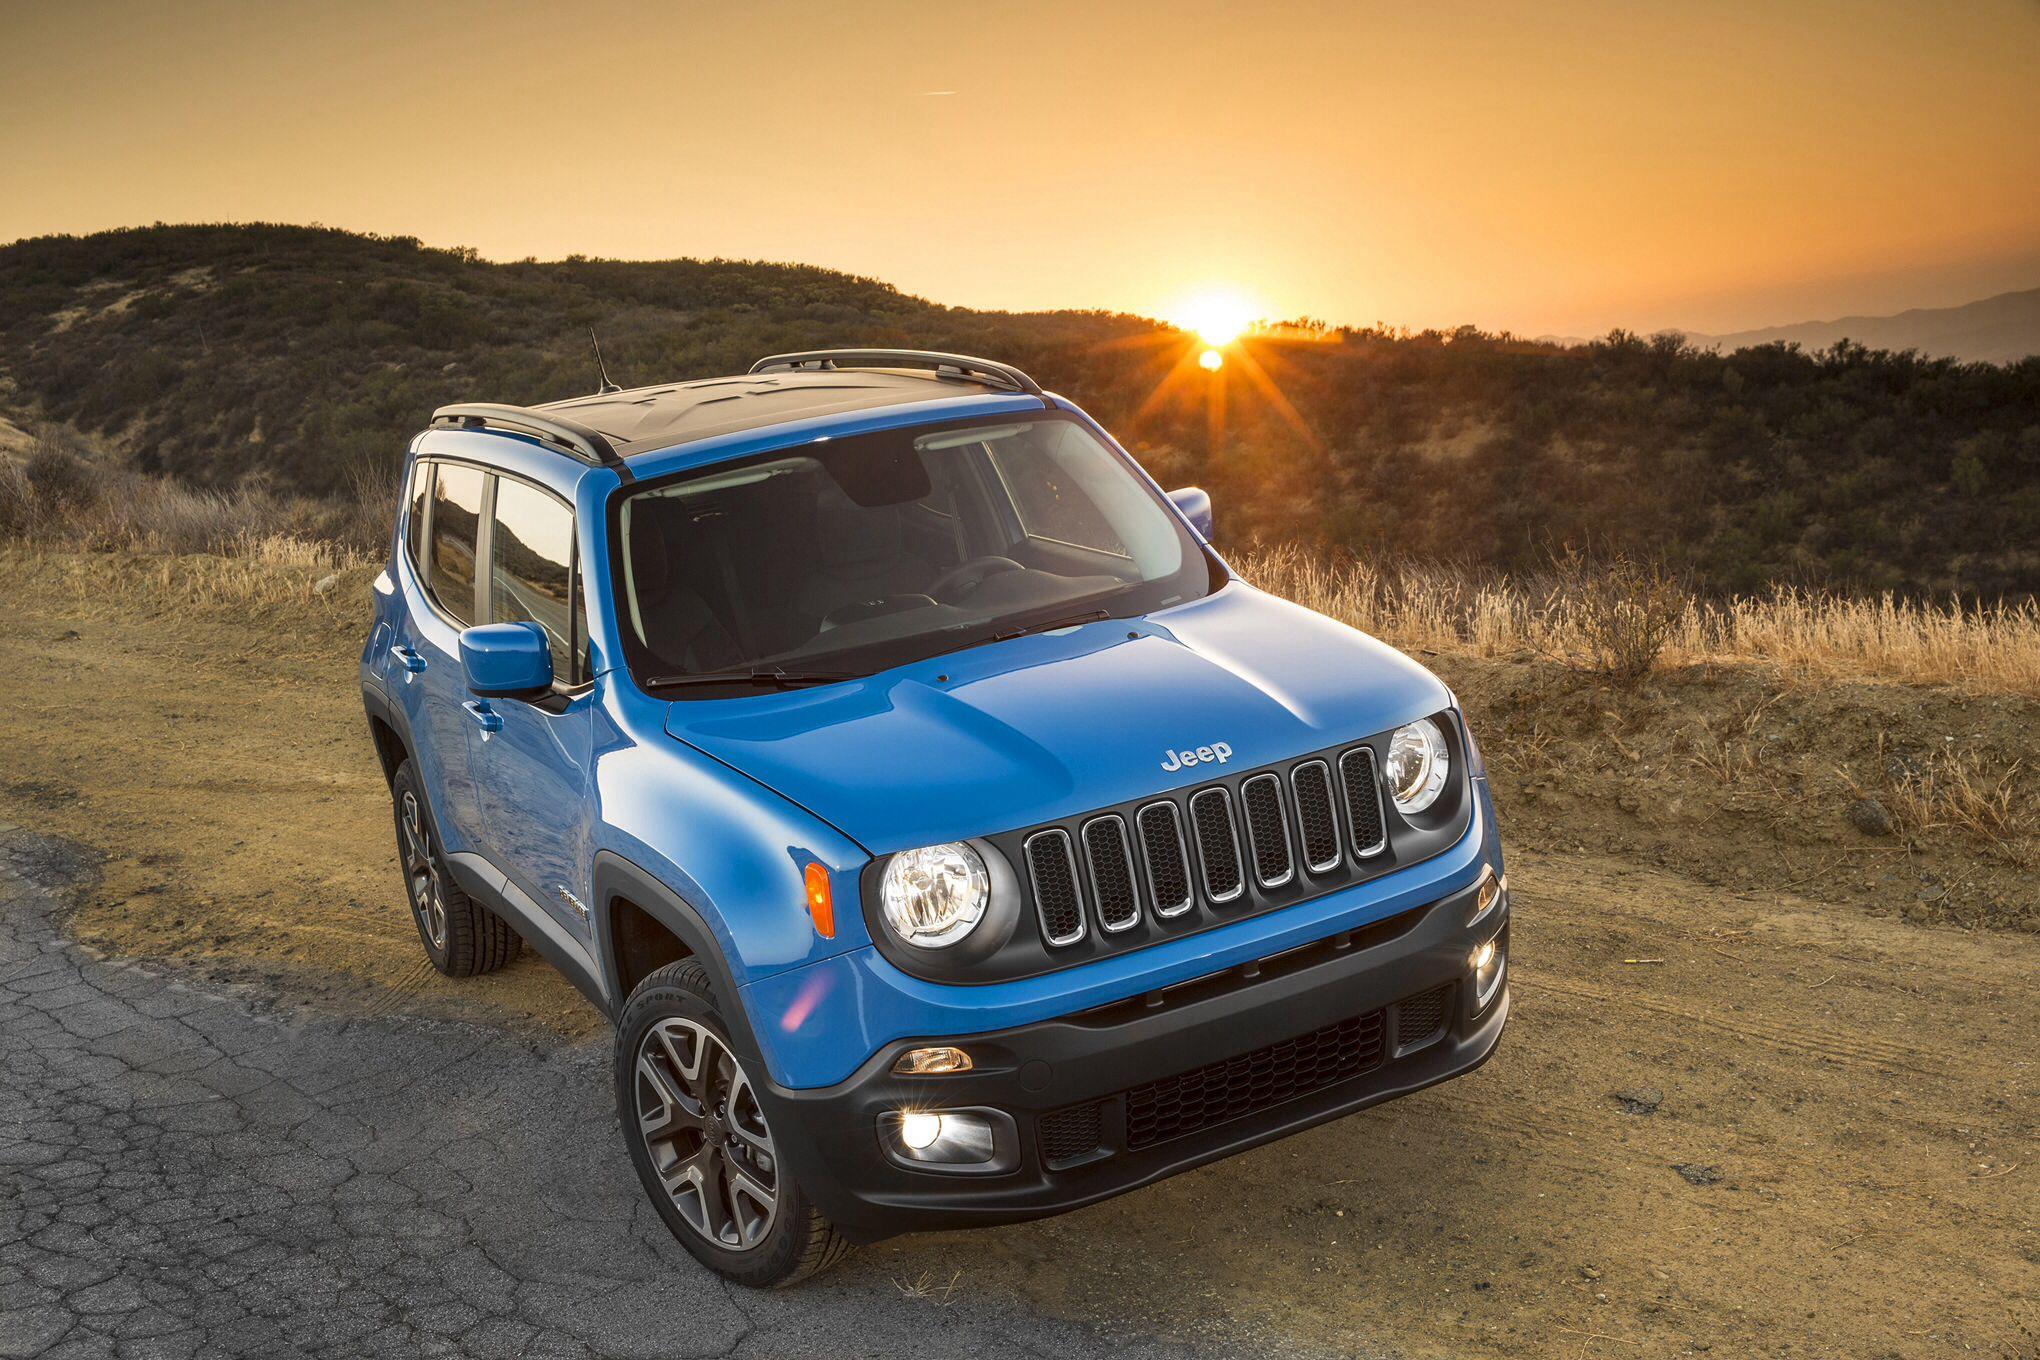 2015 Jeep Renegade Aqua Blue Jeep renegade, 2015 jeep